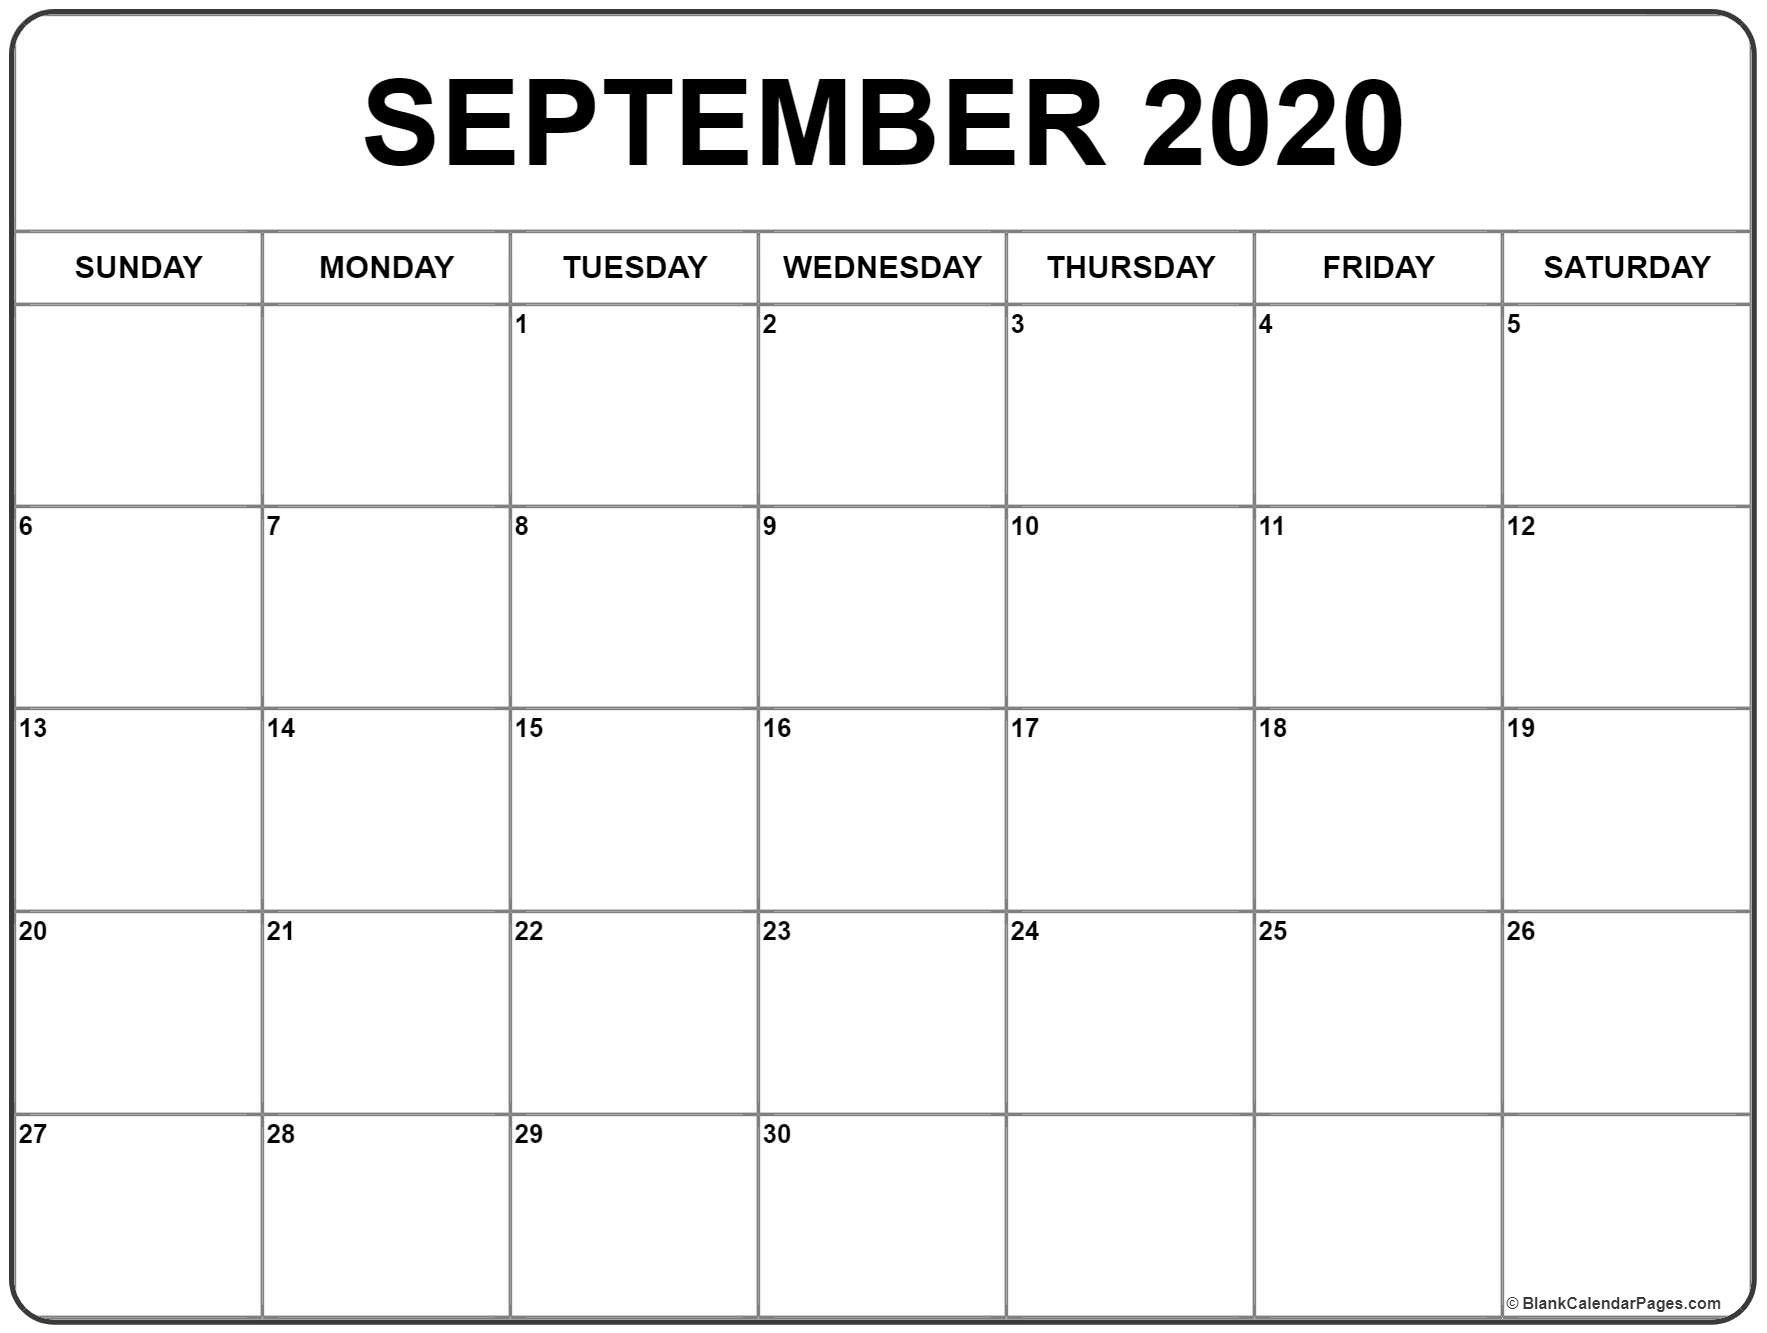 Julian Calendar 2020 - Free Download Printable Calendar